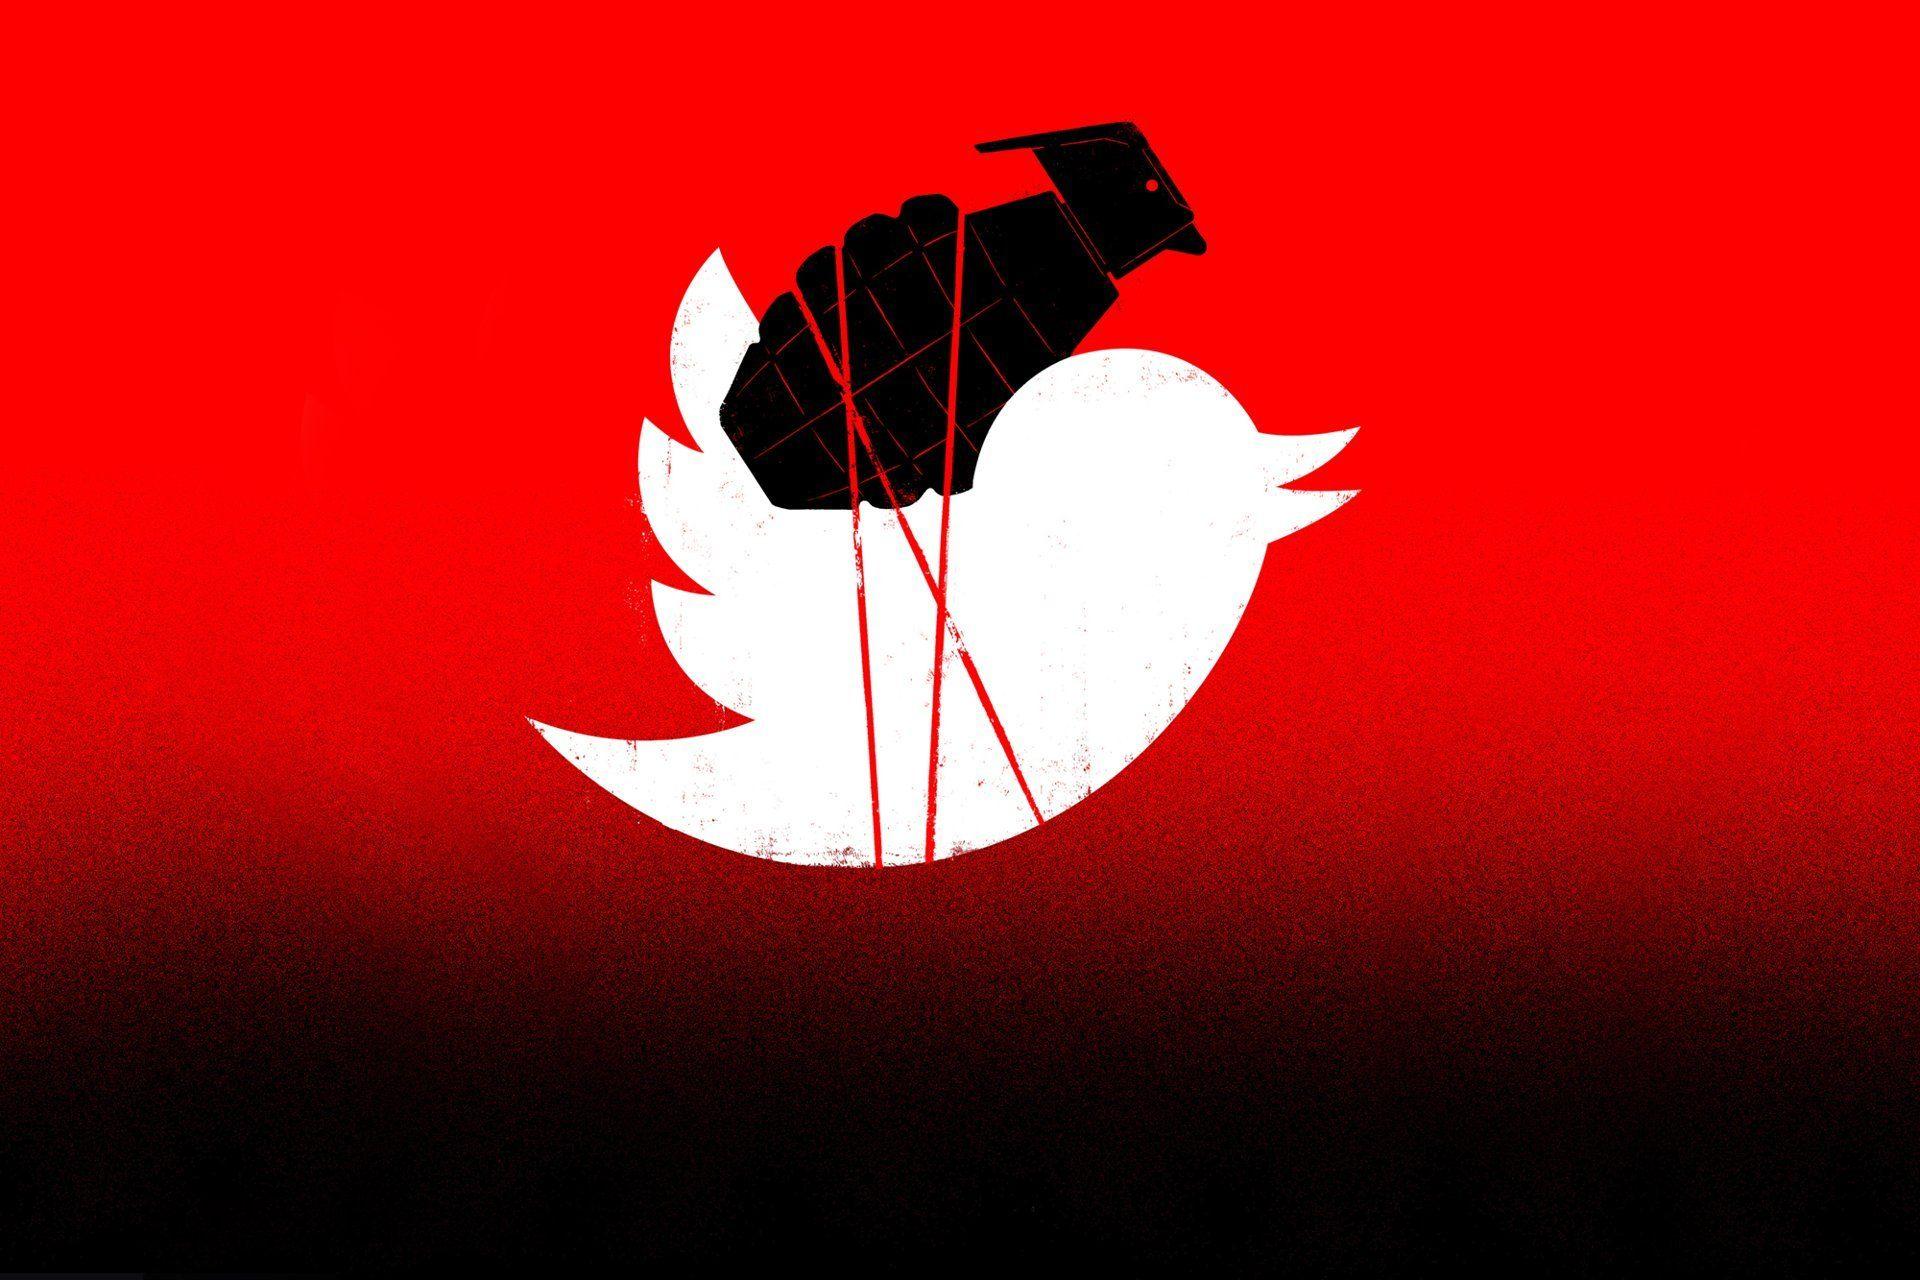 Has Ukraine lost modern media war?